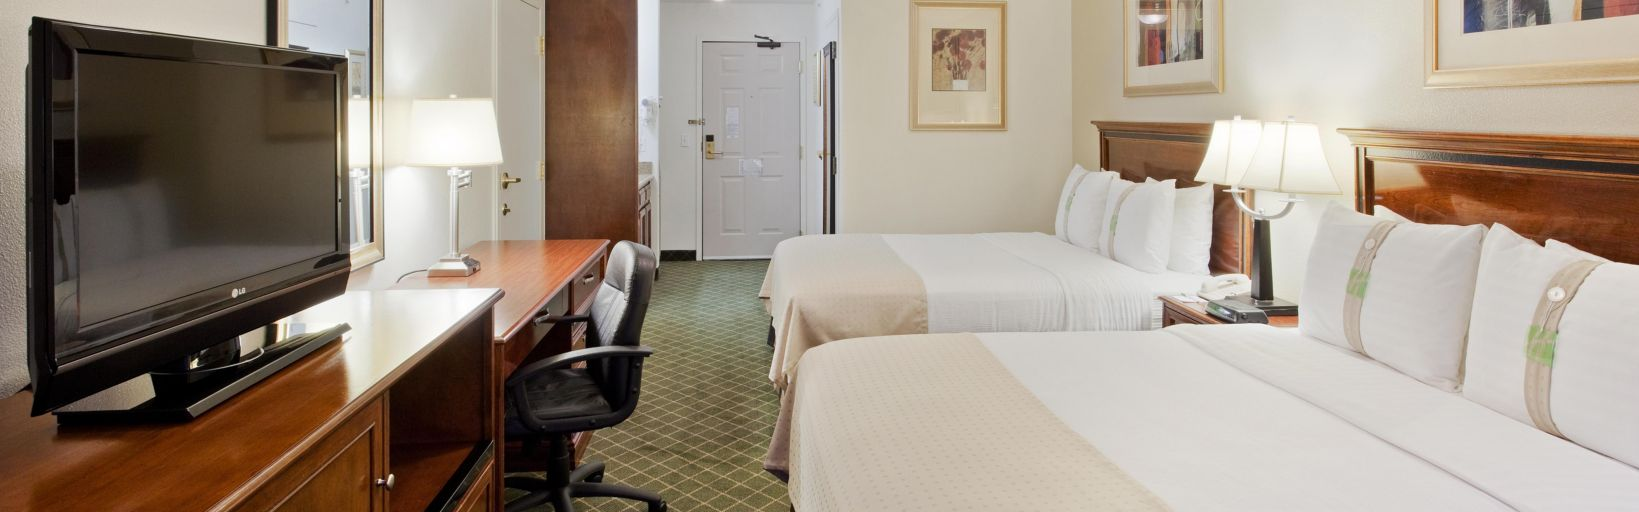 Holiday Inn Redding Hotel By Ihg